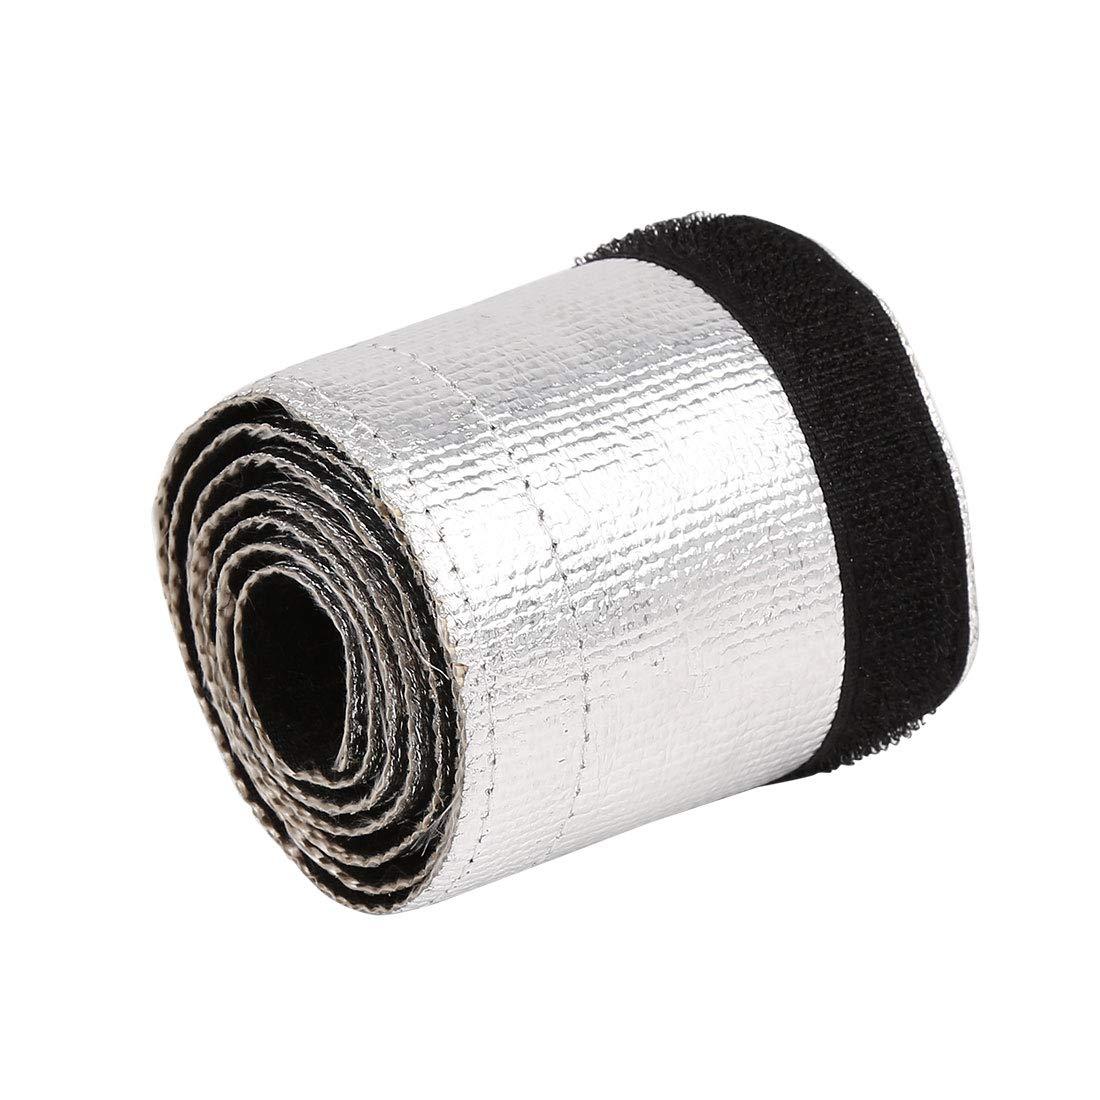 X AUTOHAUX 91 x 8.5cm Car Exhaust Pipe Fiber Cloth High Heat Shield Shroud